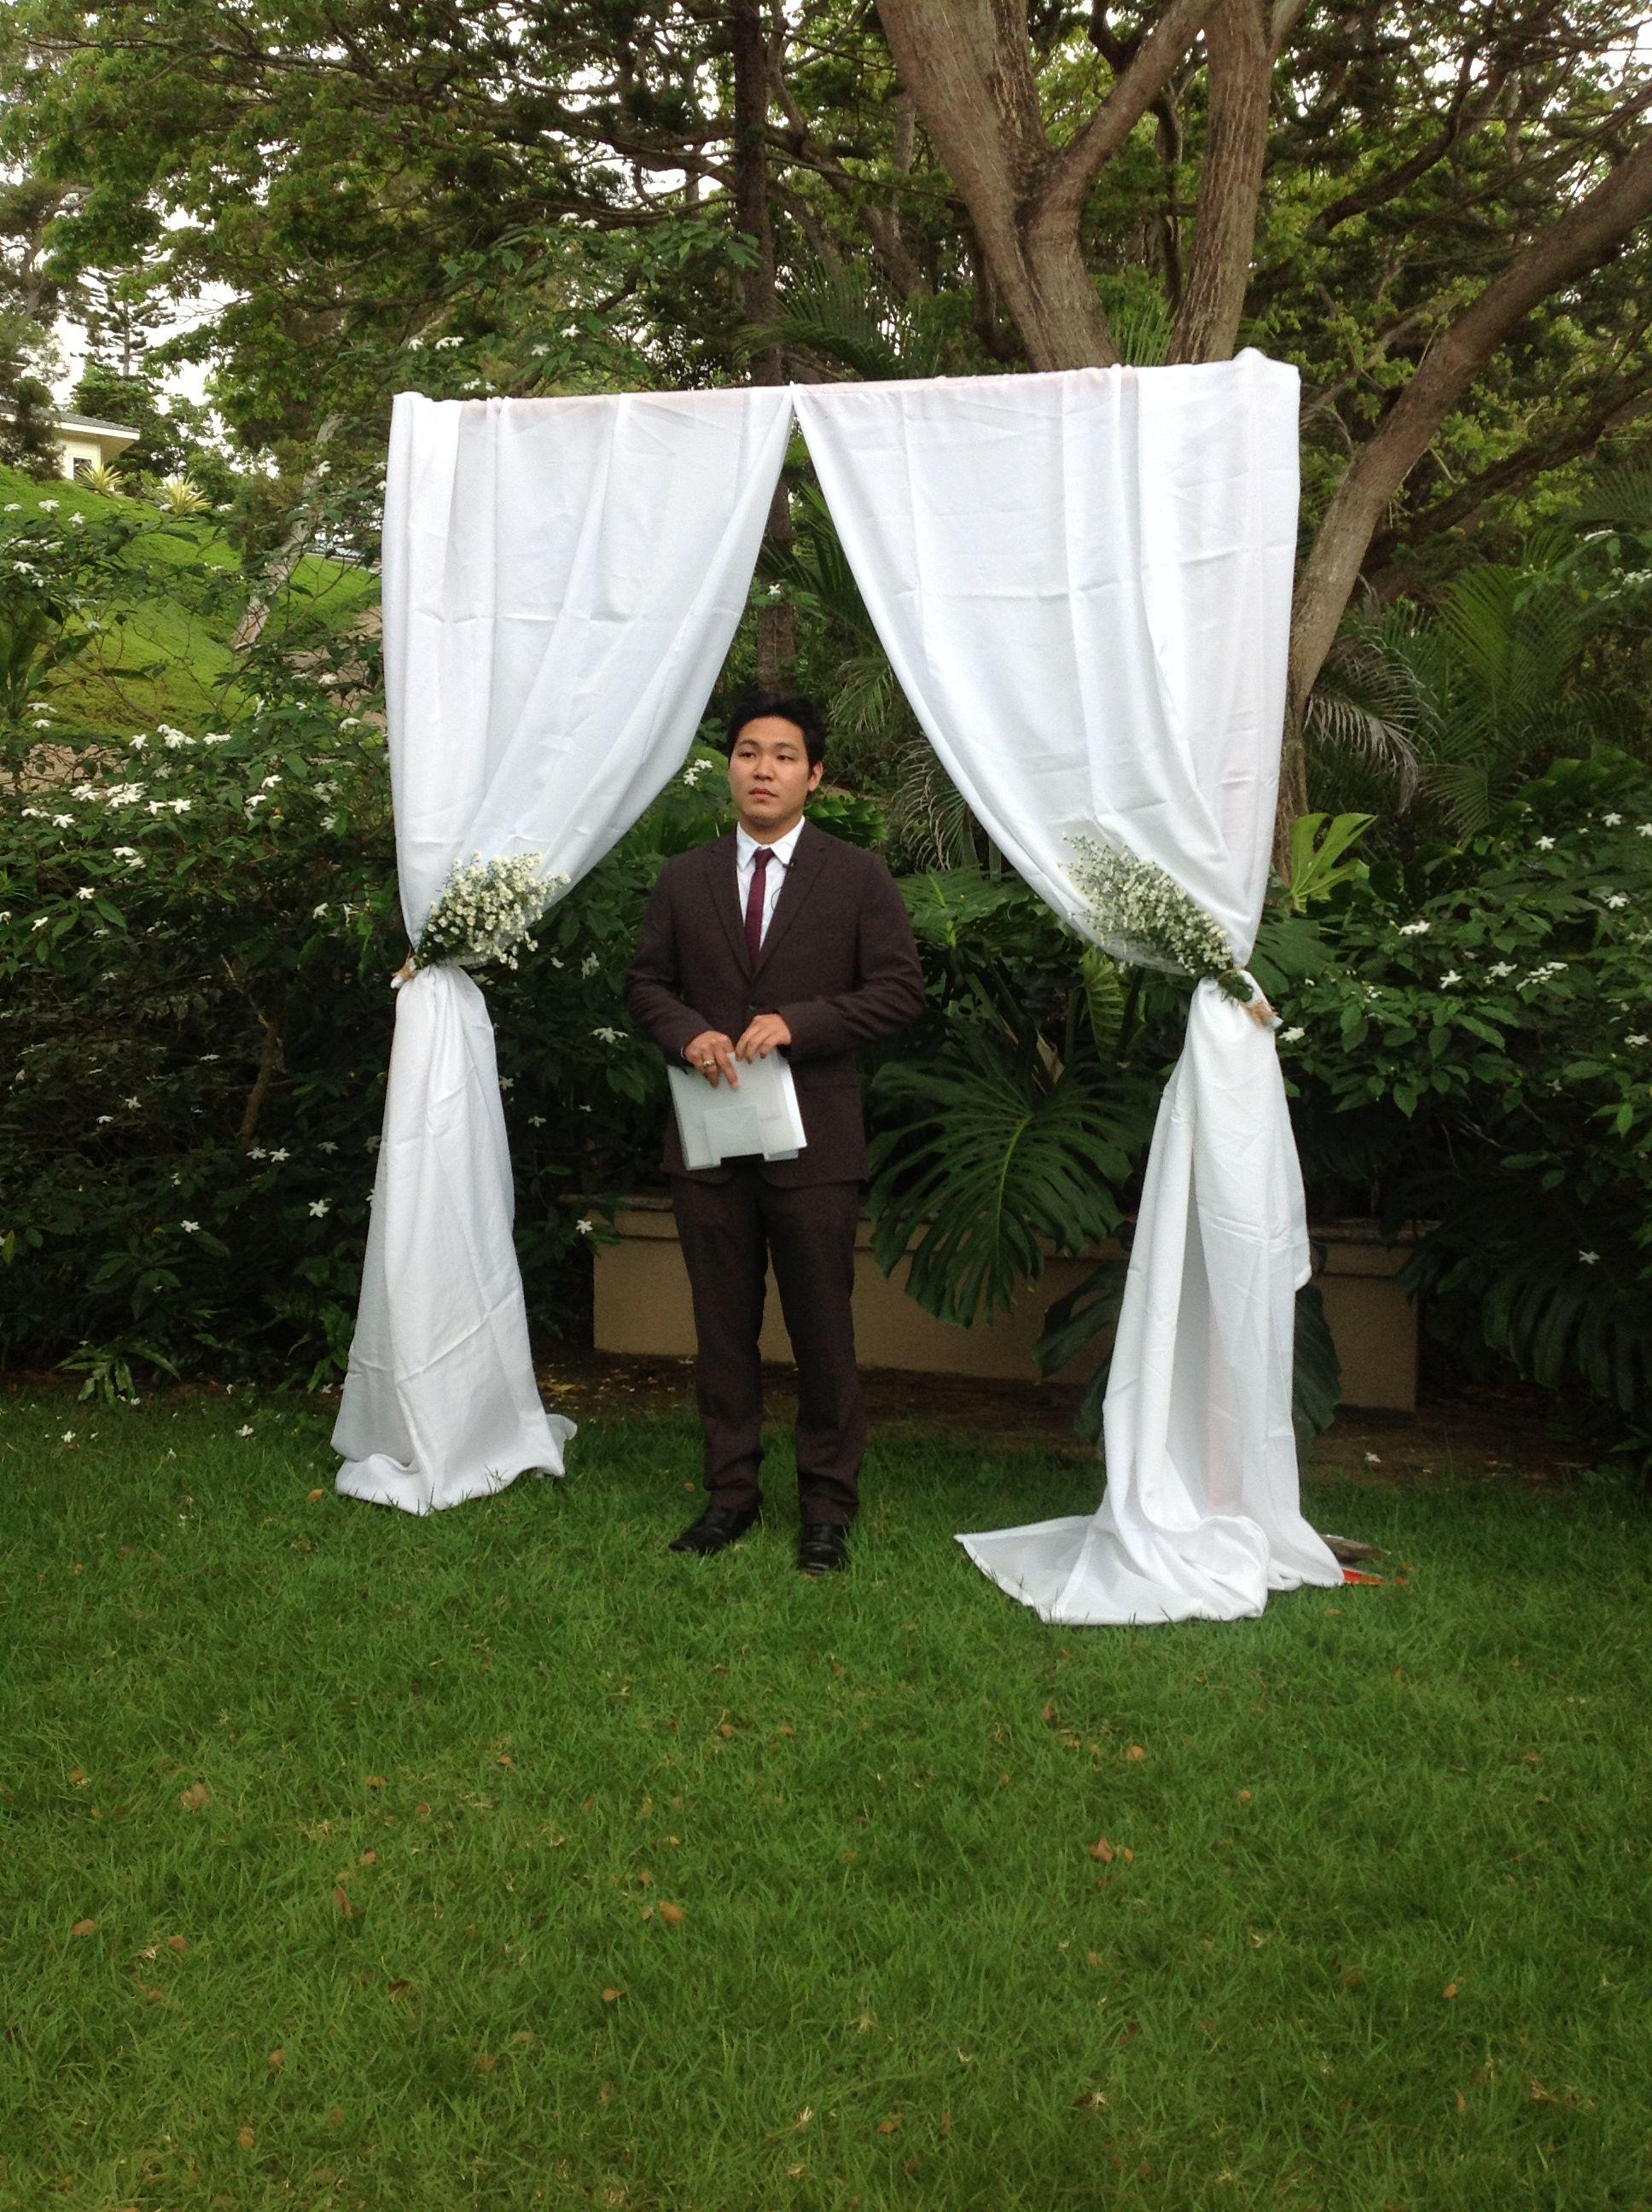 rustic curtain arbor | My best friends wedding;) | Pinterest